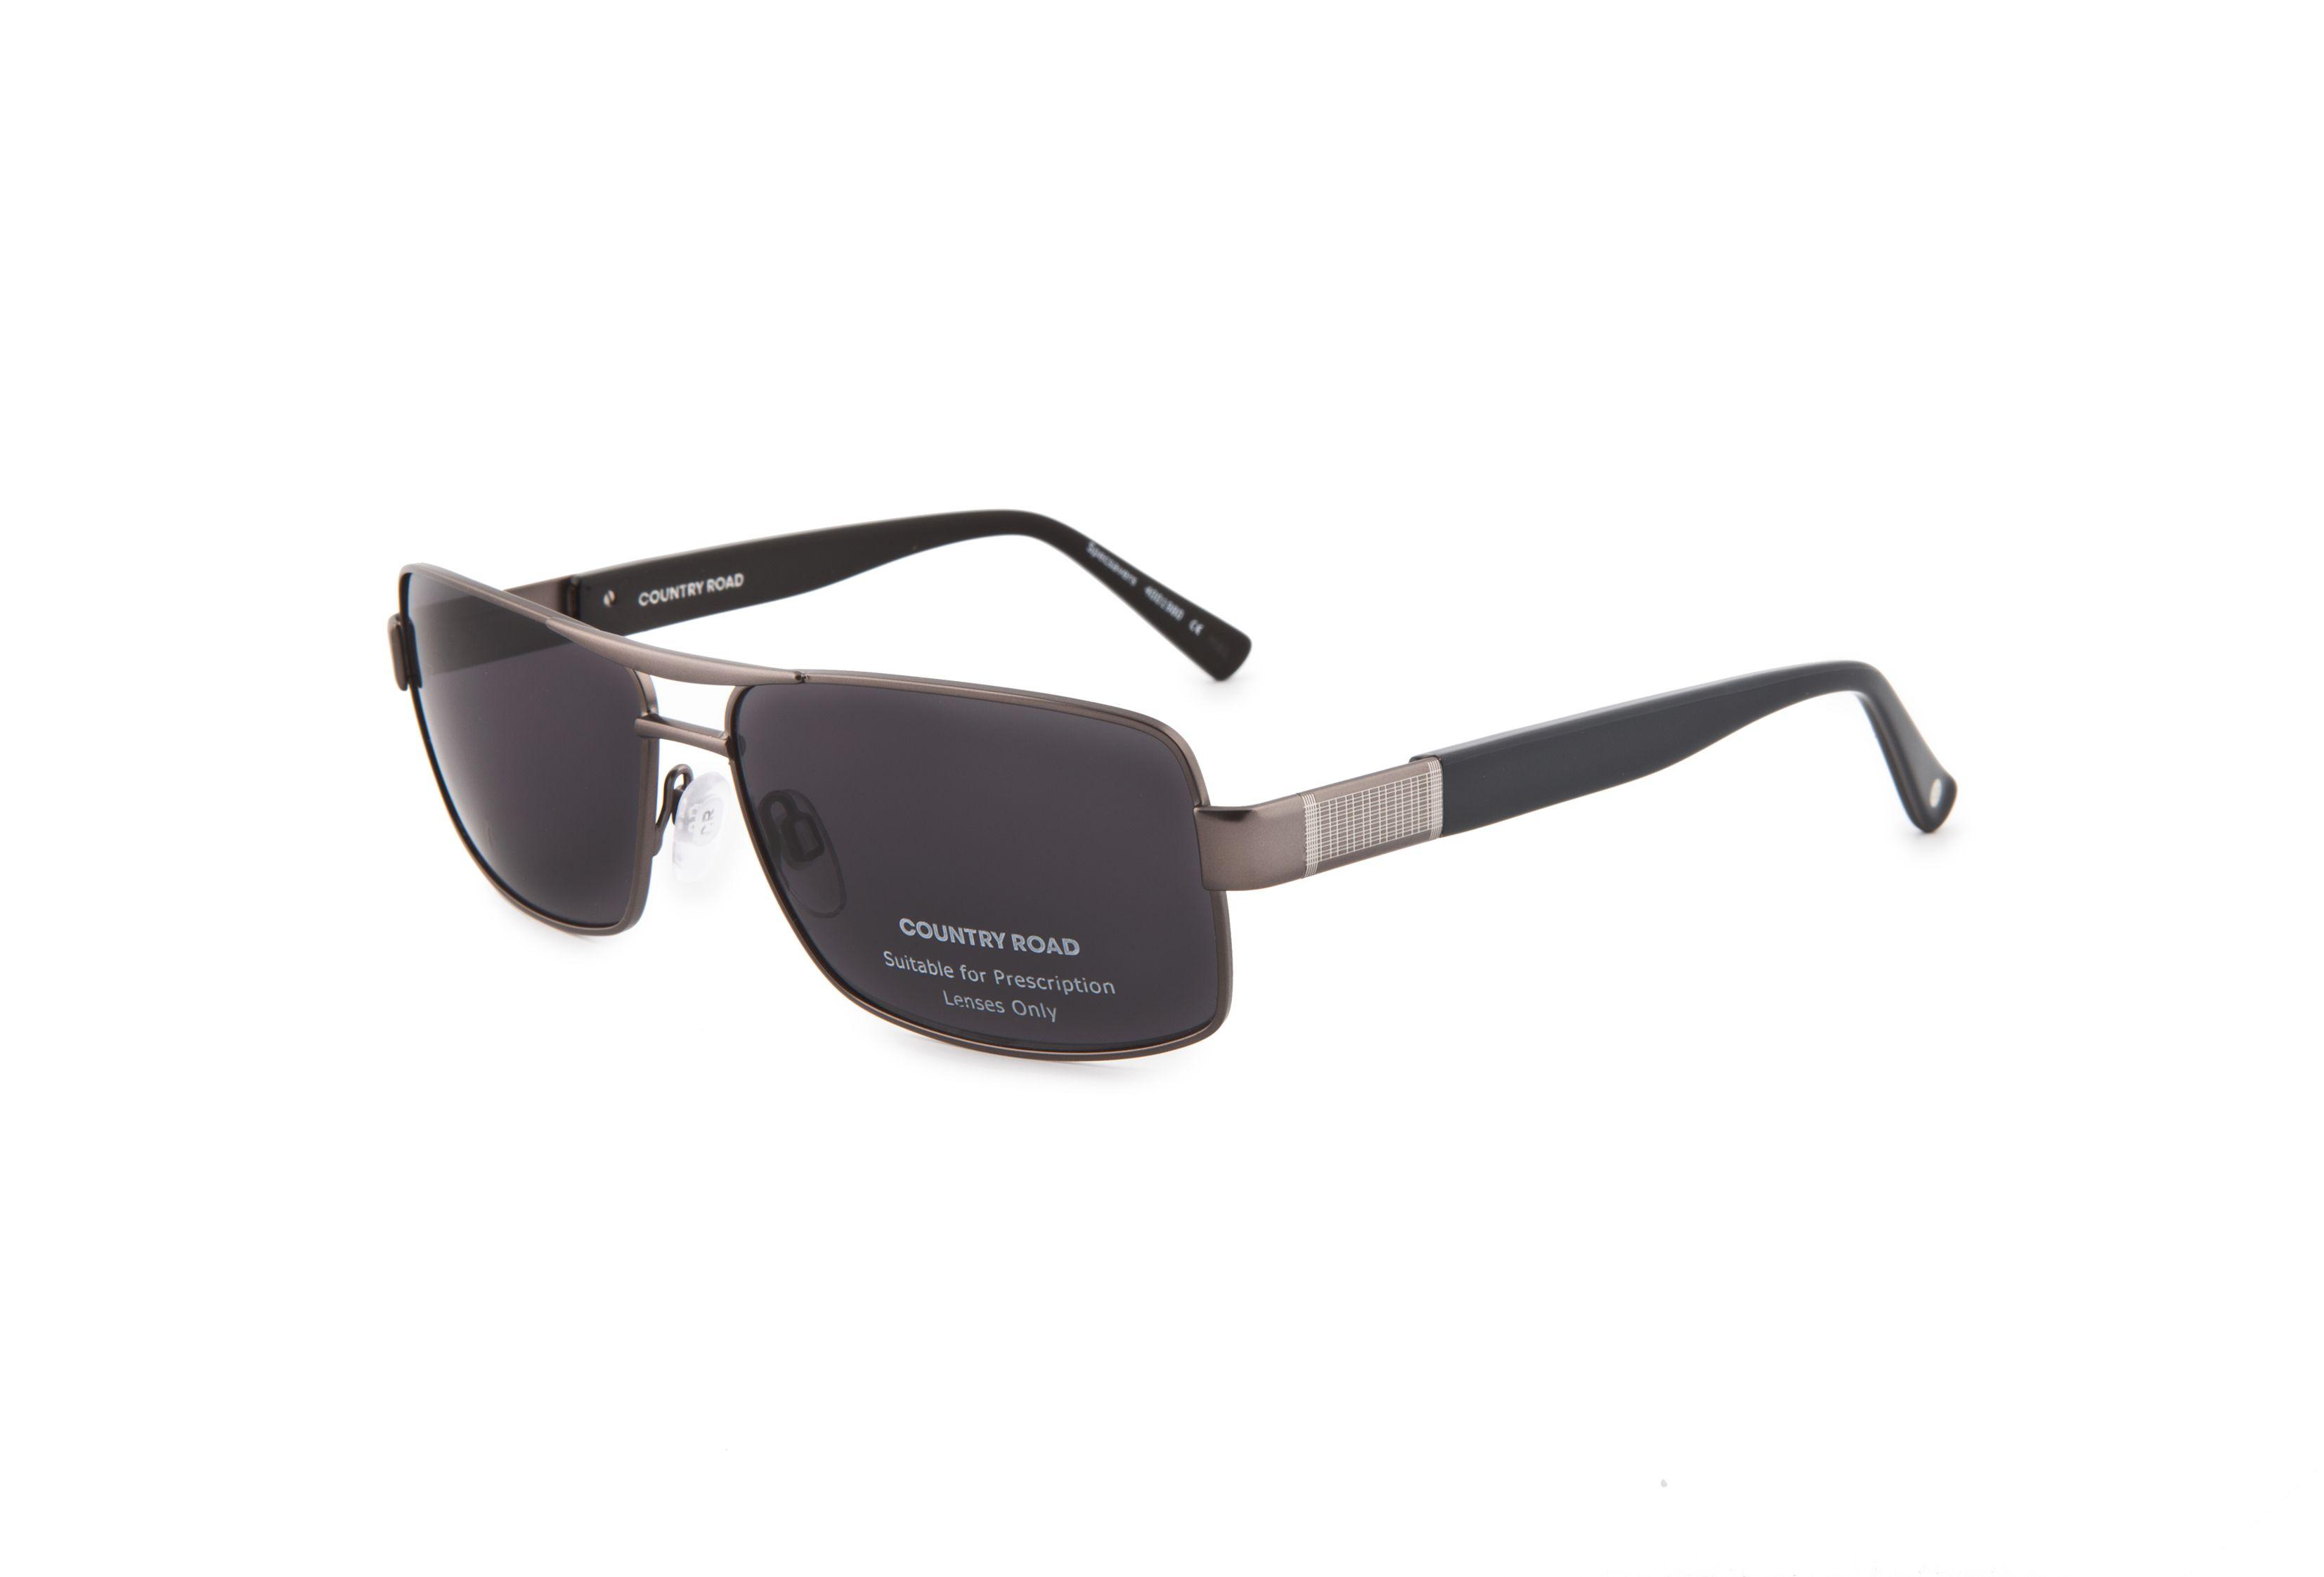 Pin By Specsavers Australia On Latest Sunglasses Range